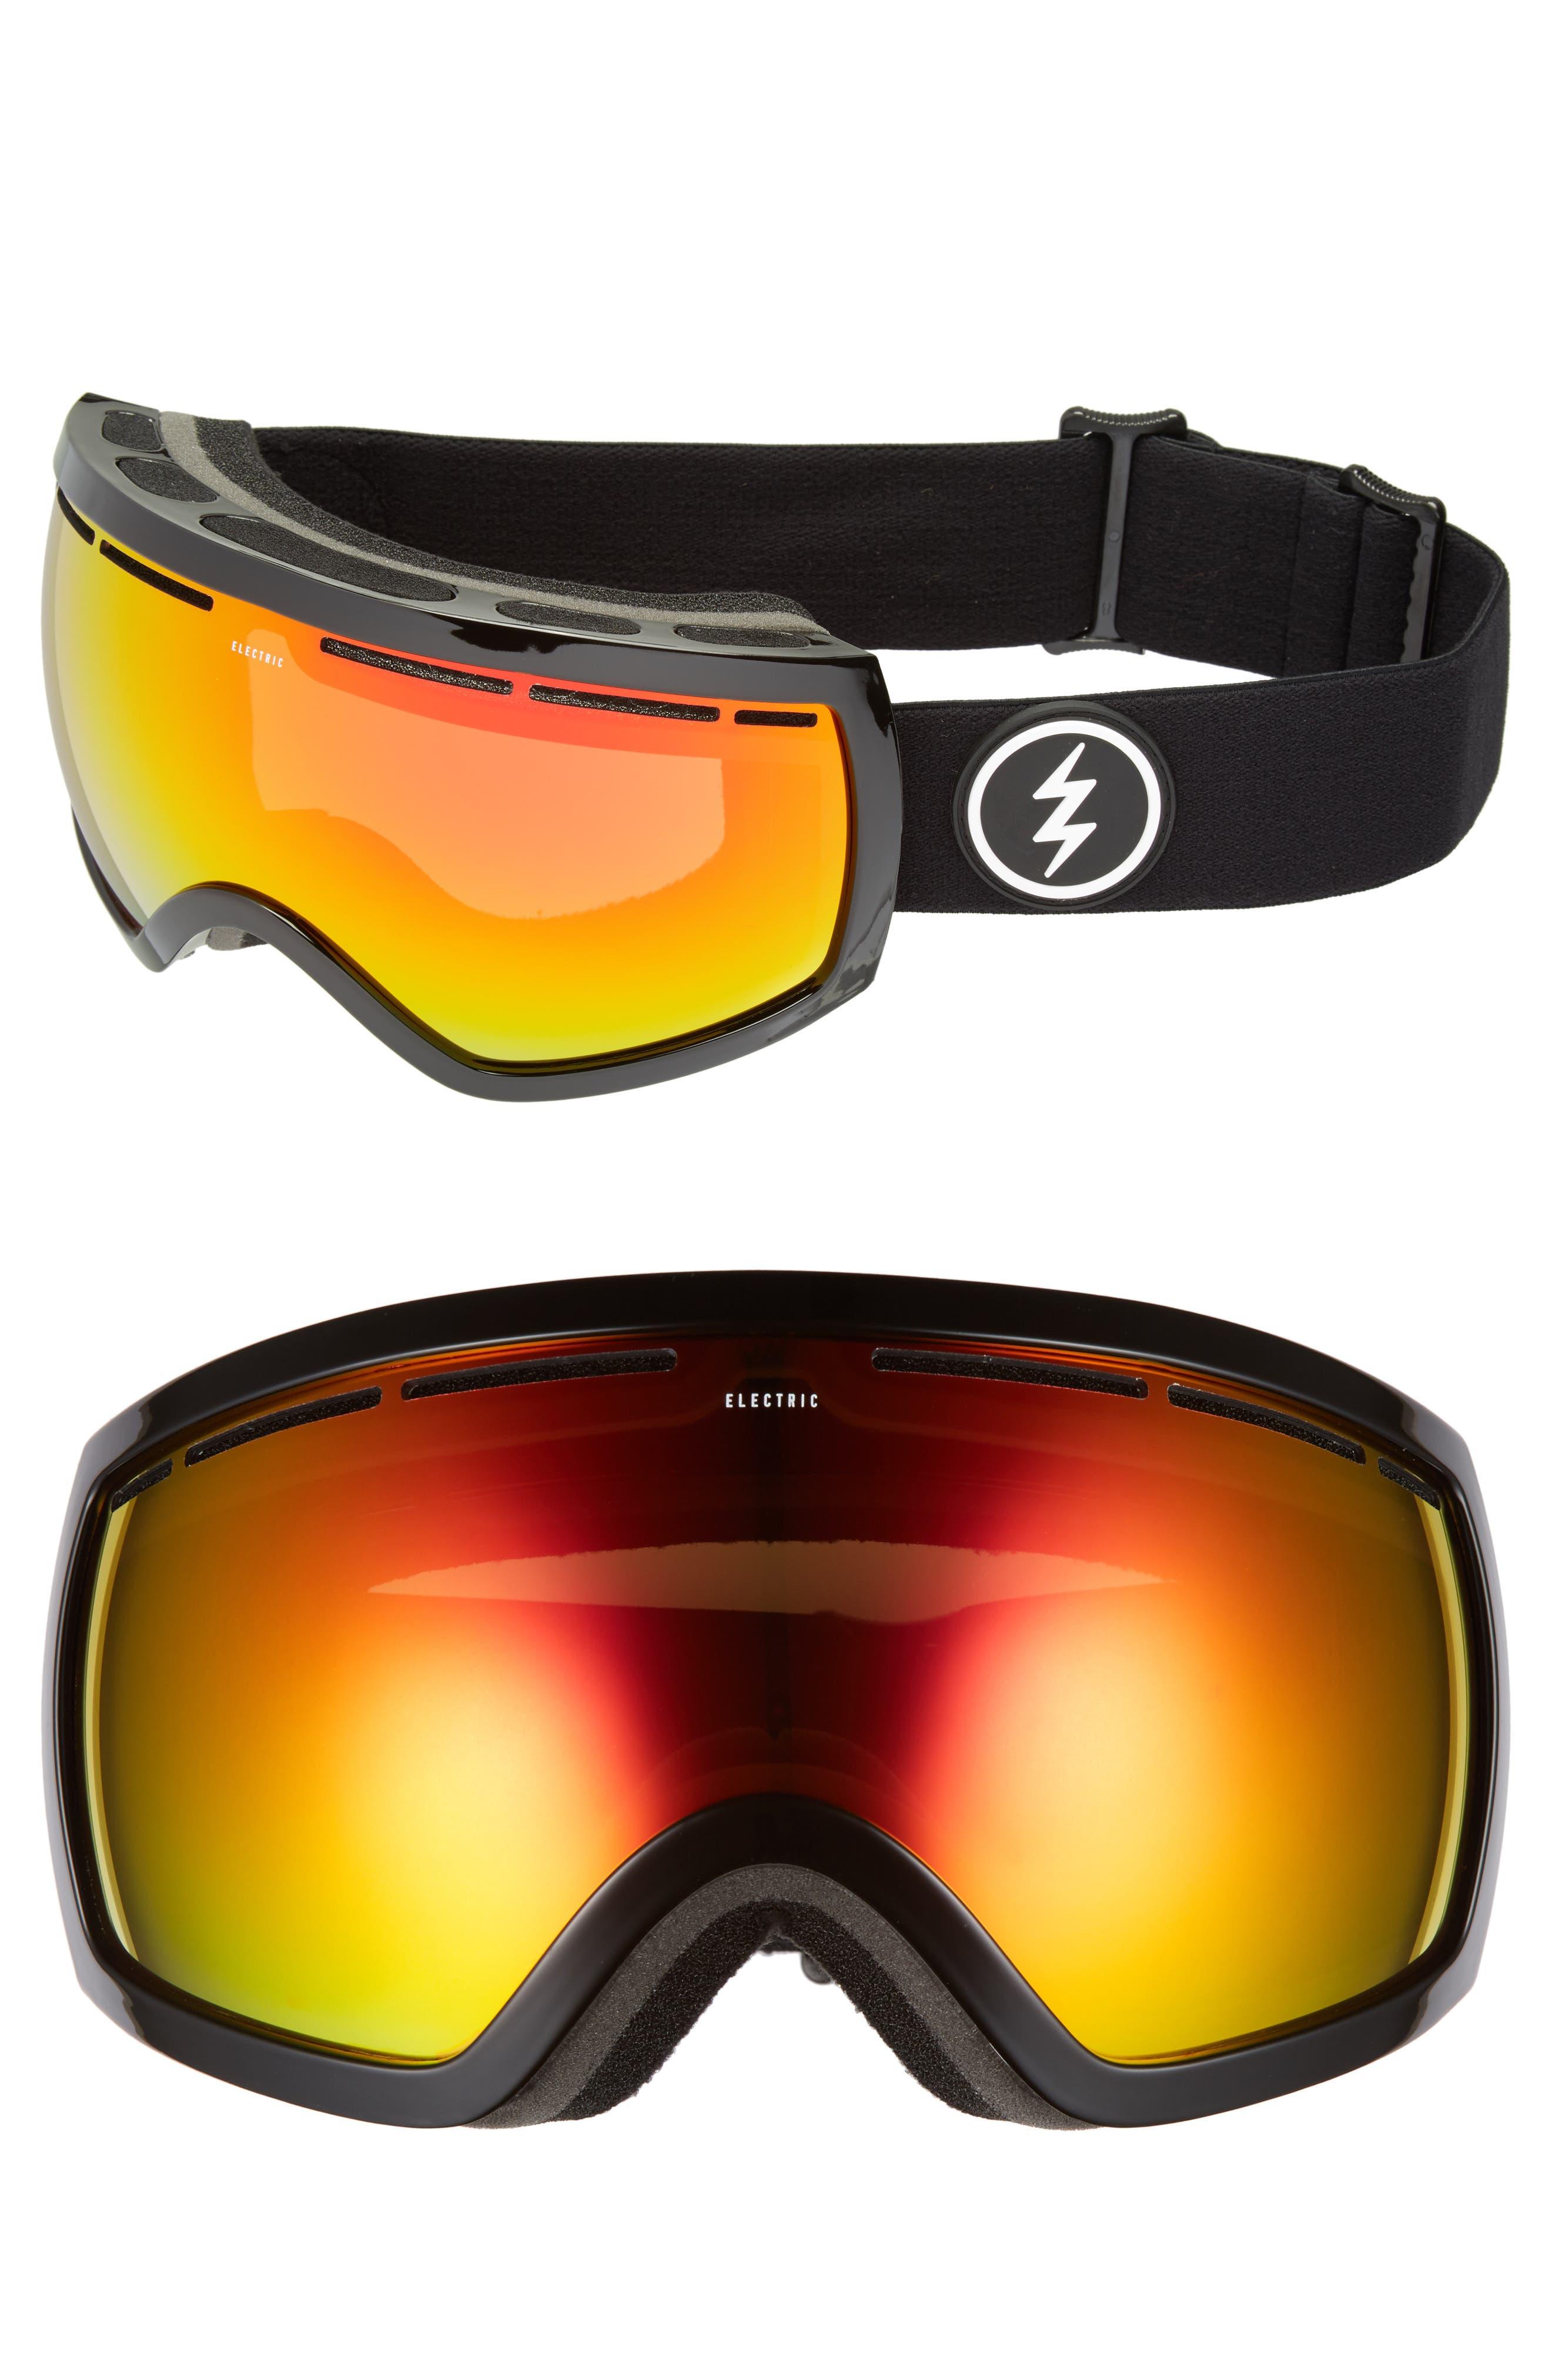 EG2.5 Snow Goggles,                         Main,                         color,